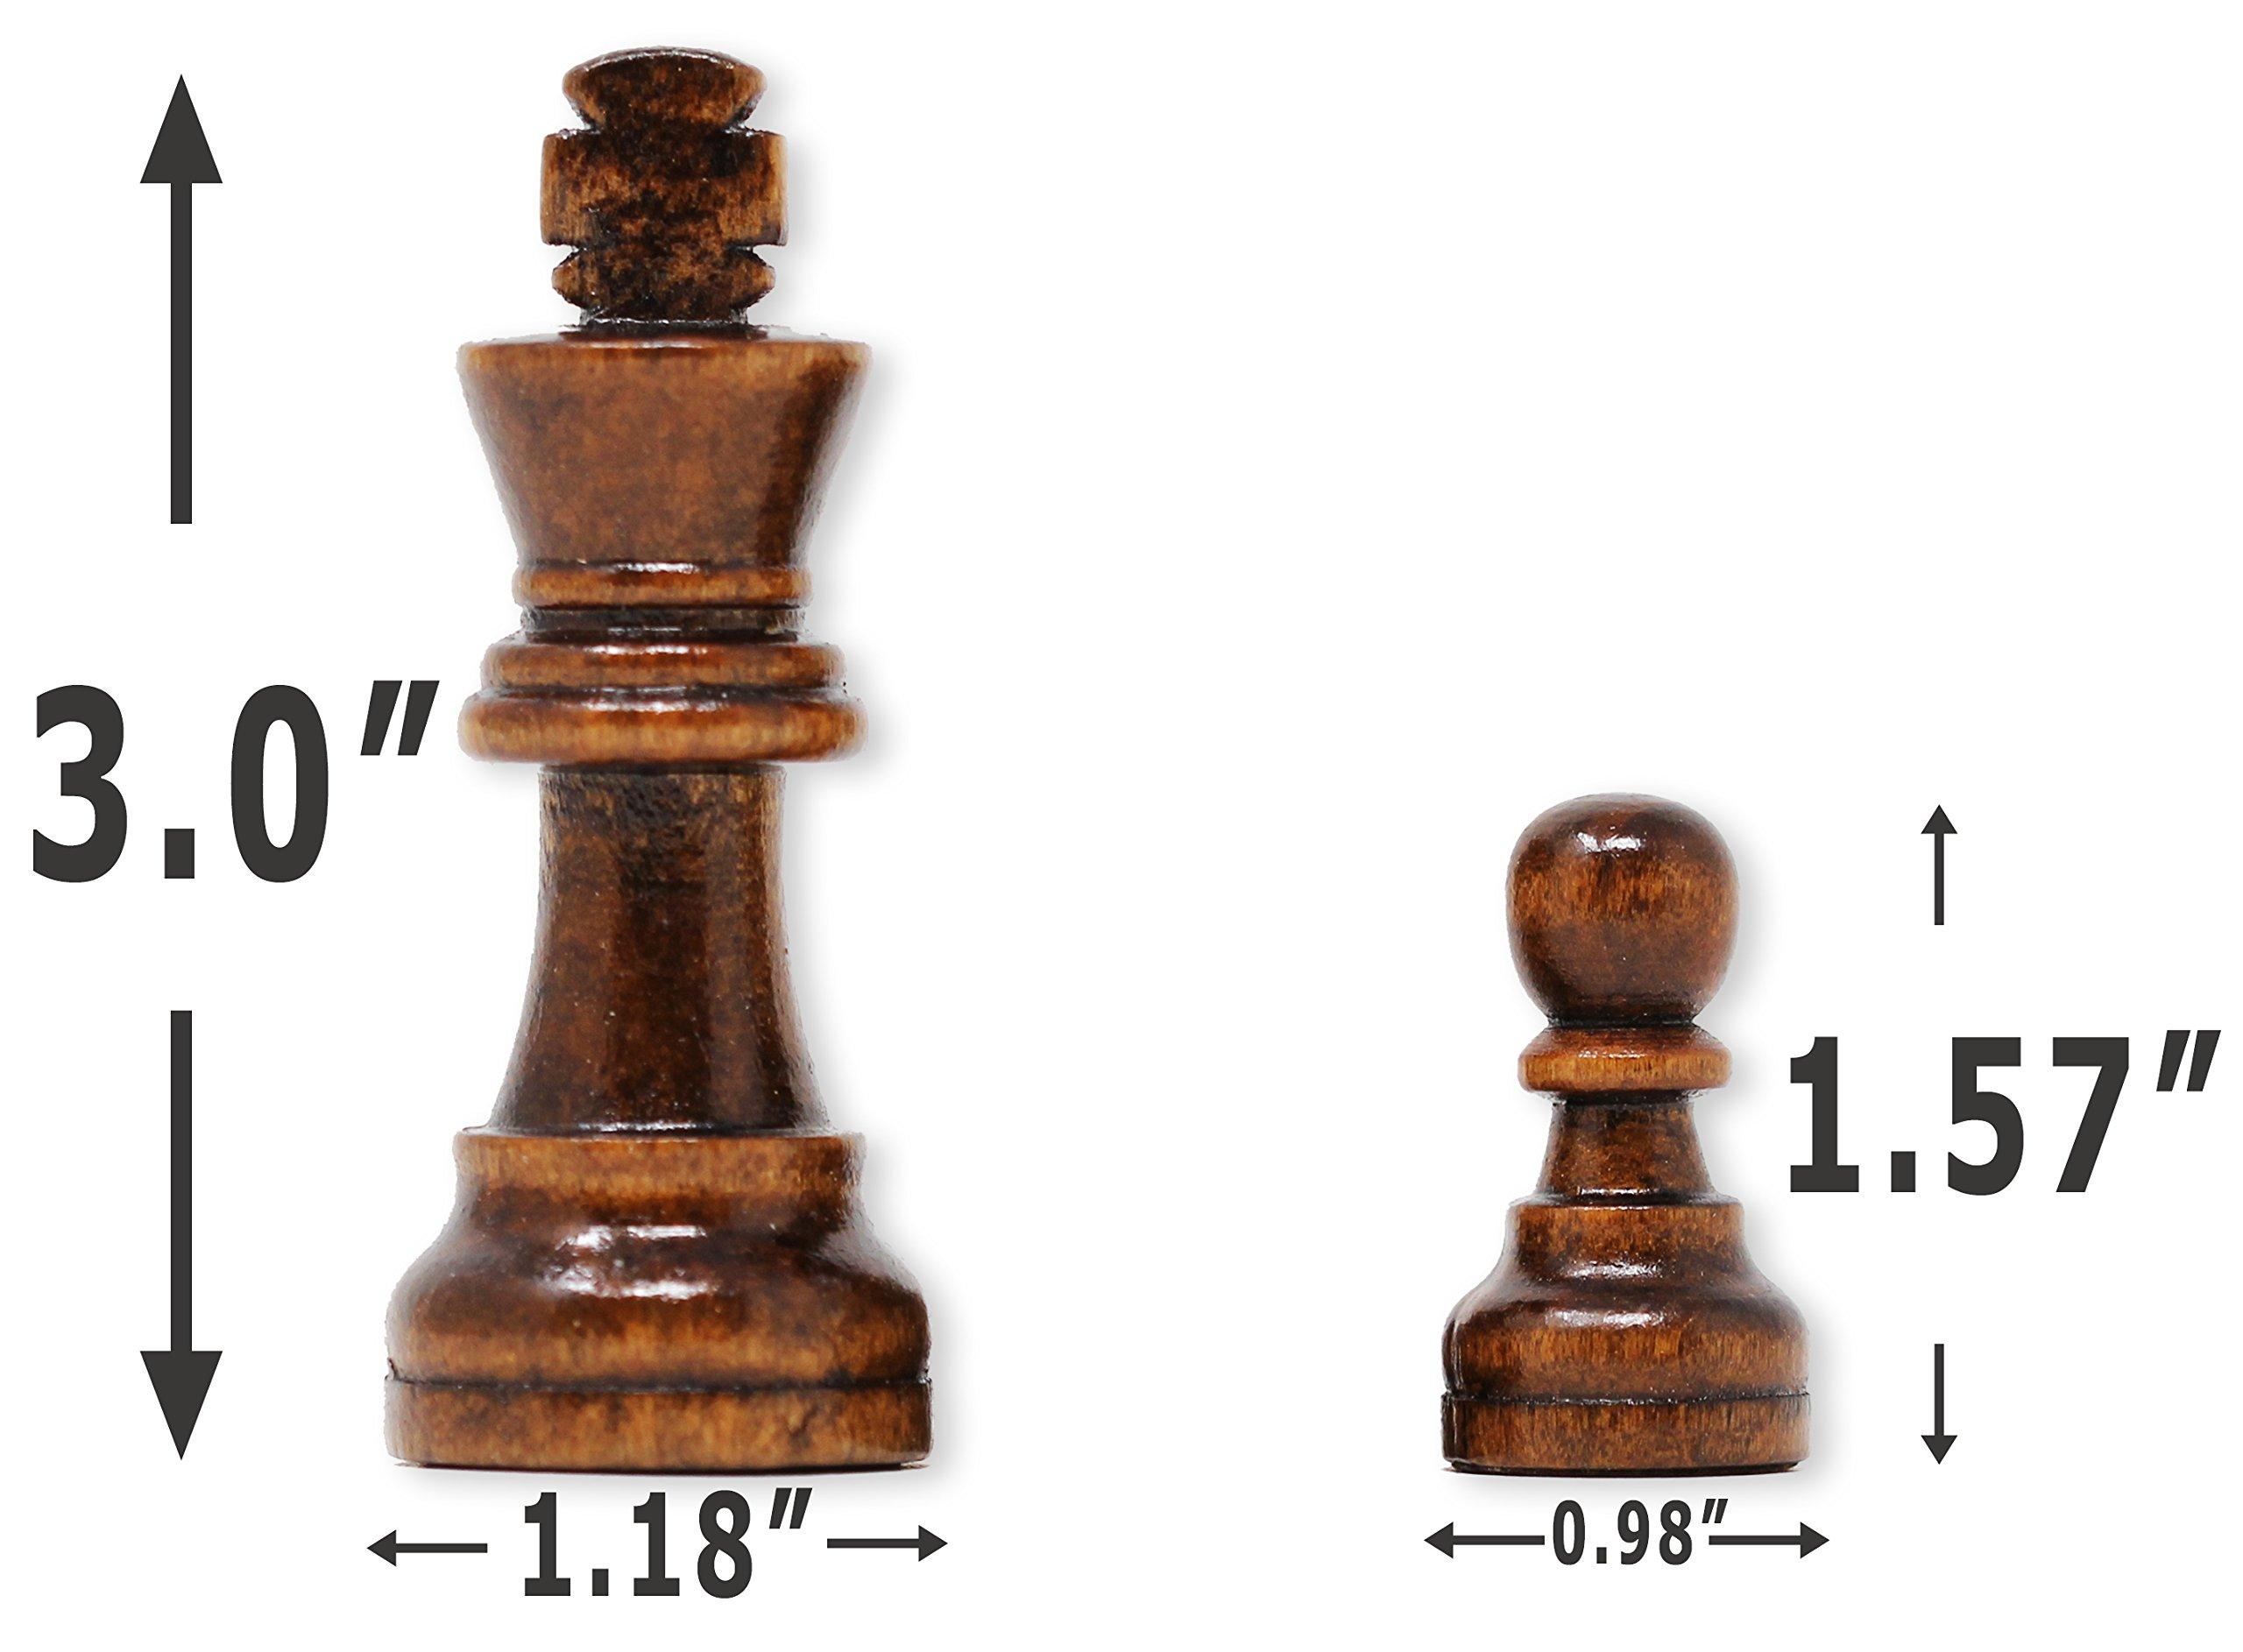 Da Vinci Staunton Wood Chess Pieces (32 Chessmen) & Storage Bag … (3 Inch King) by DaVinci (Image #3)